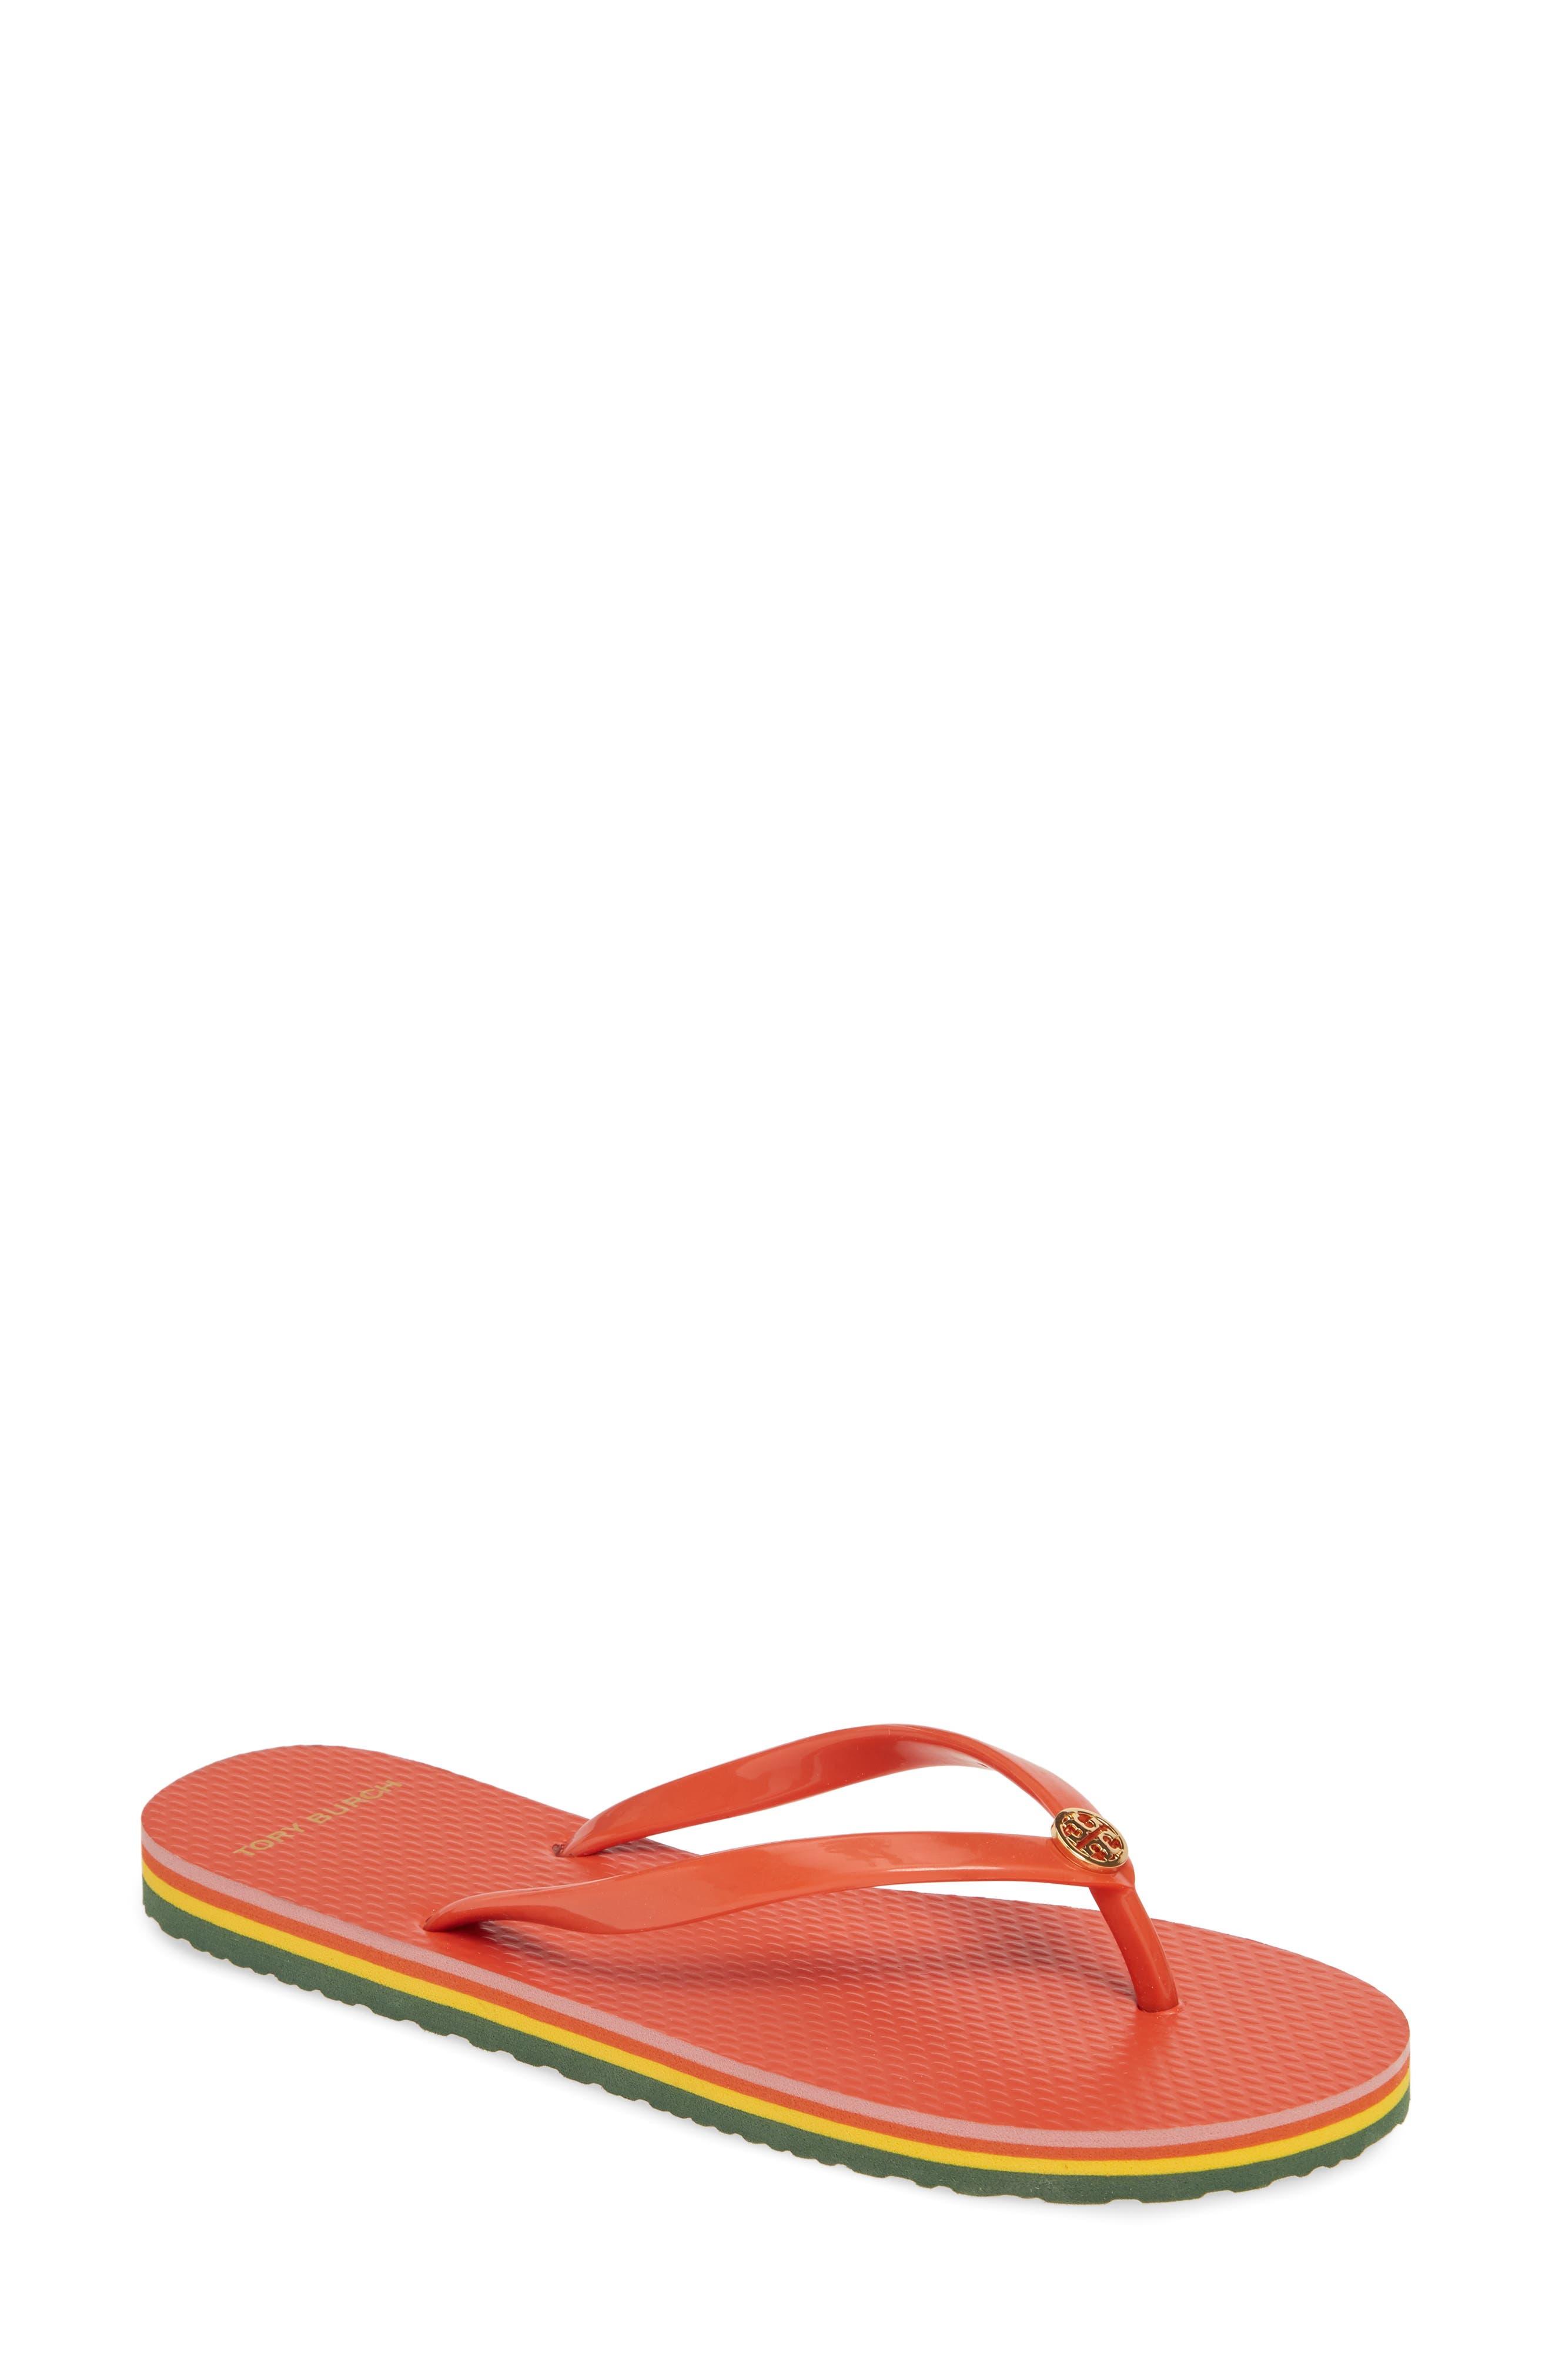 Tory Burch Thin Flip Flop, Orange